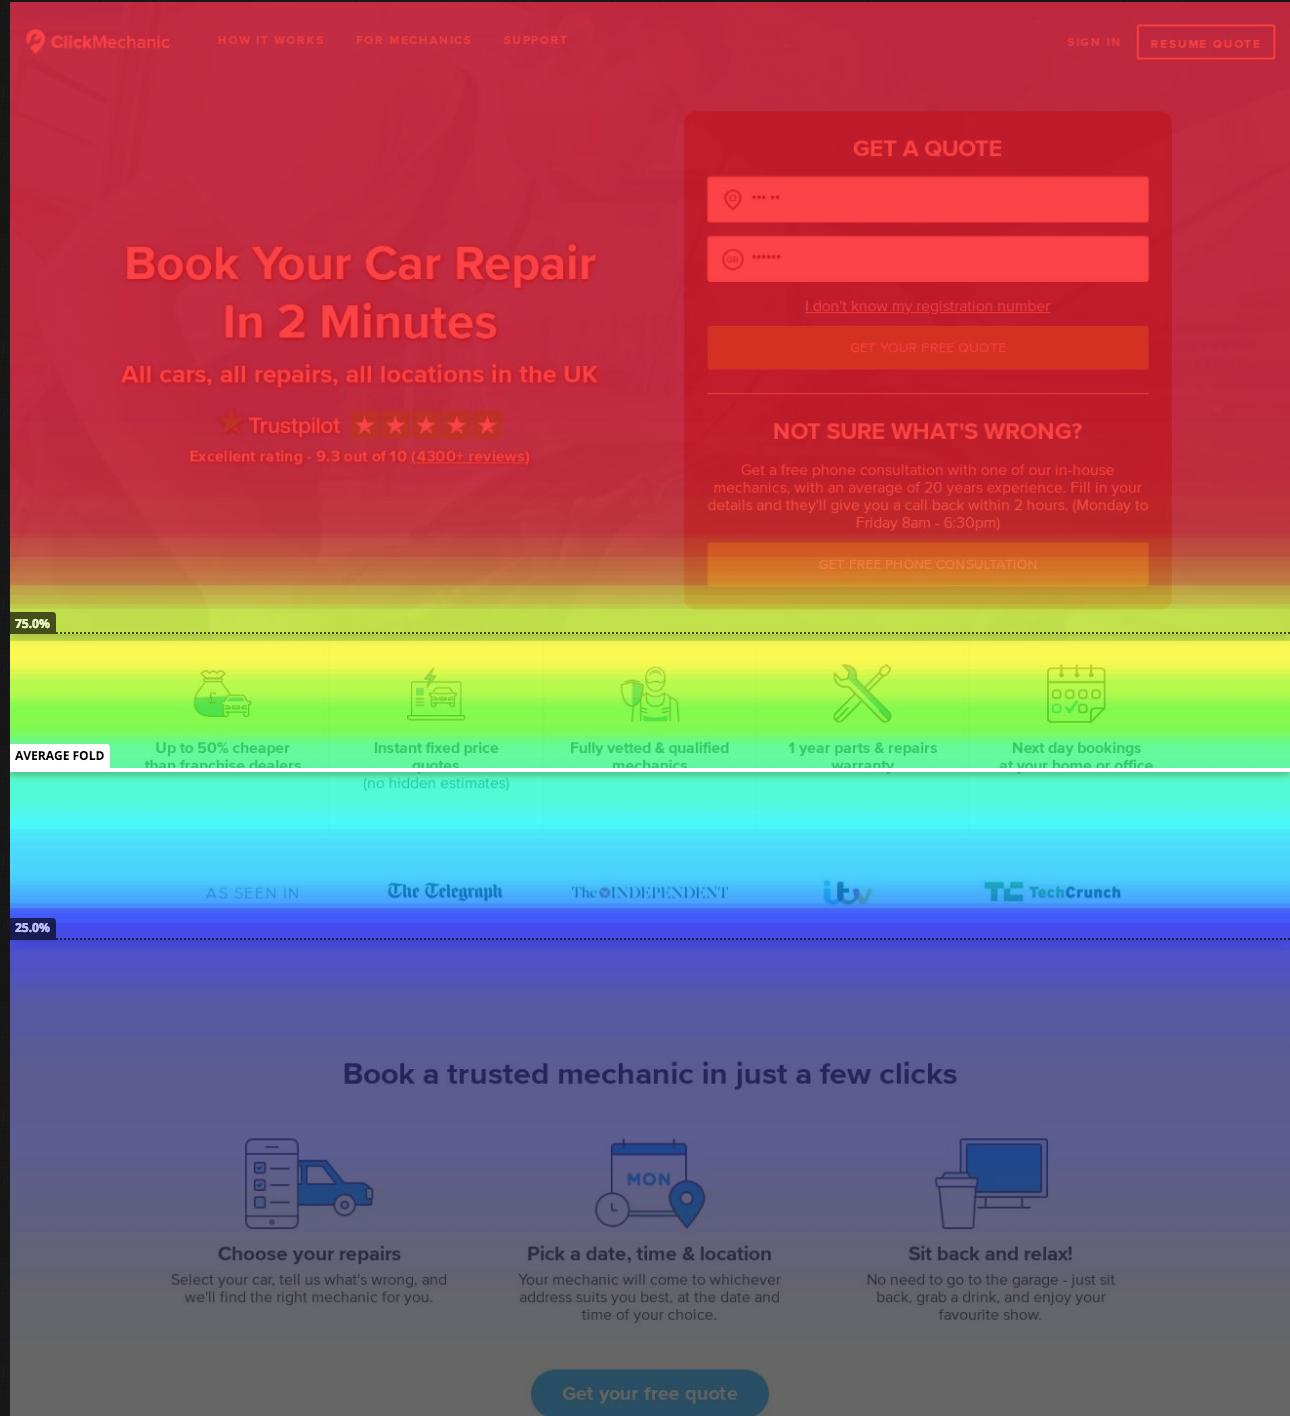 clickmechanic-hotjar-heatmap